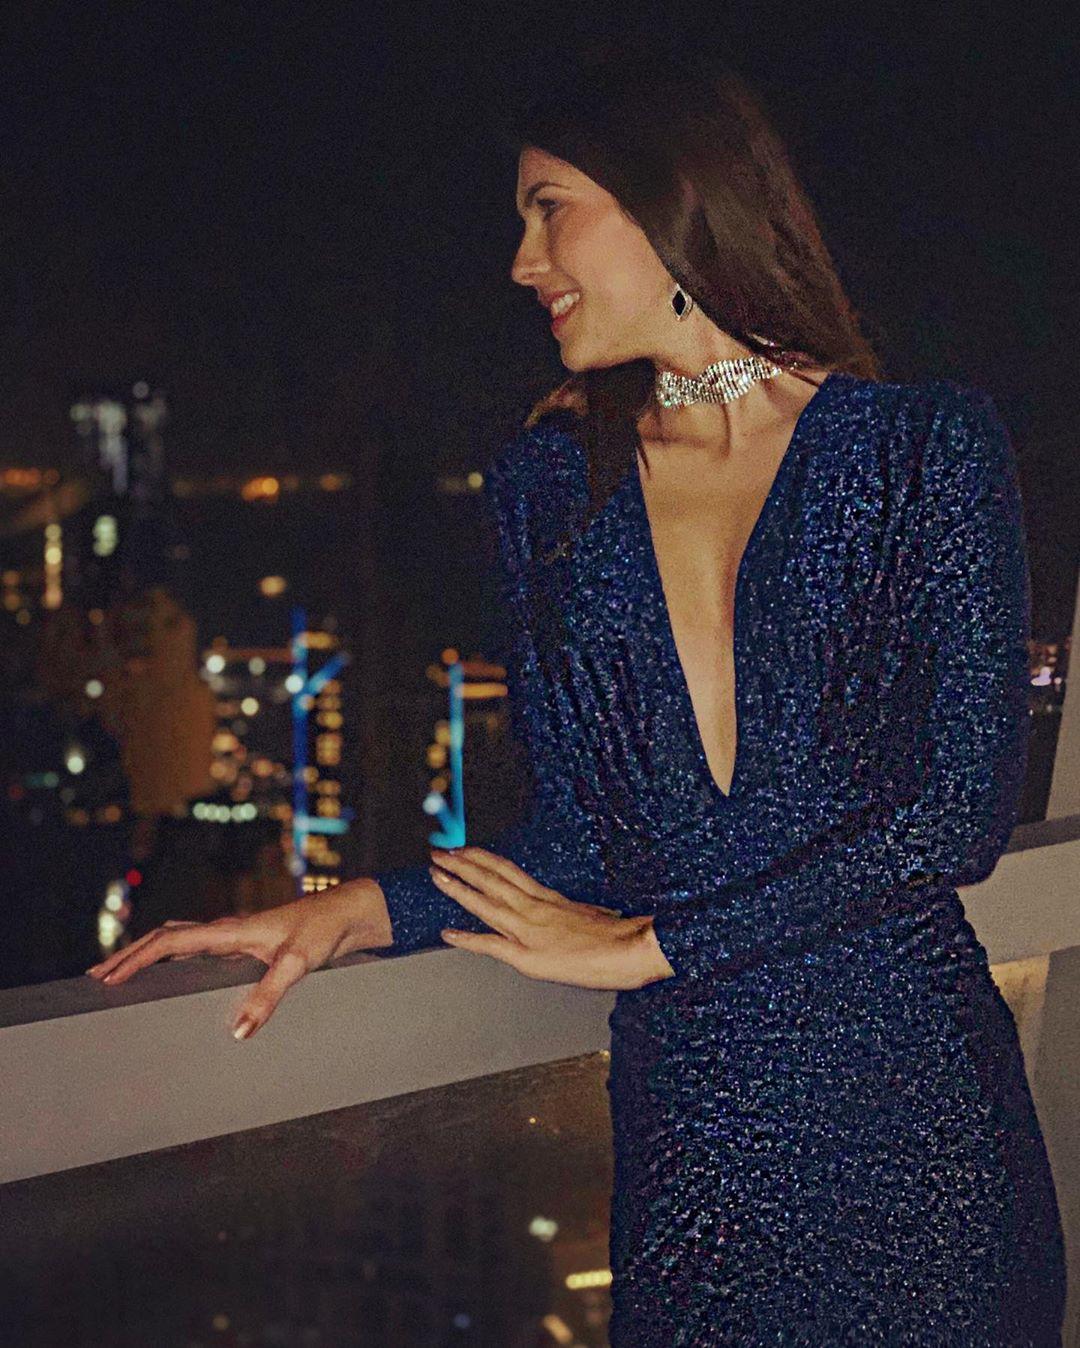 Electric blue and cobalt blue dress formal wear, attire ideas